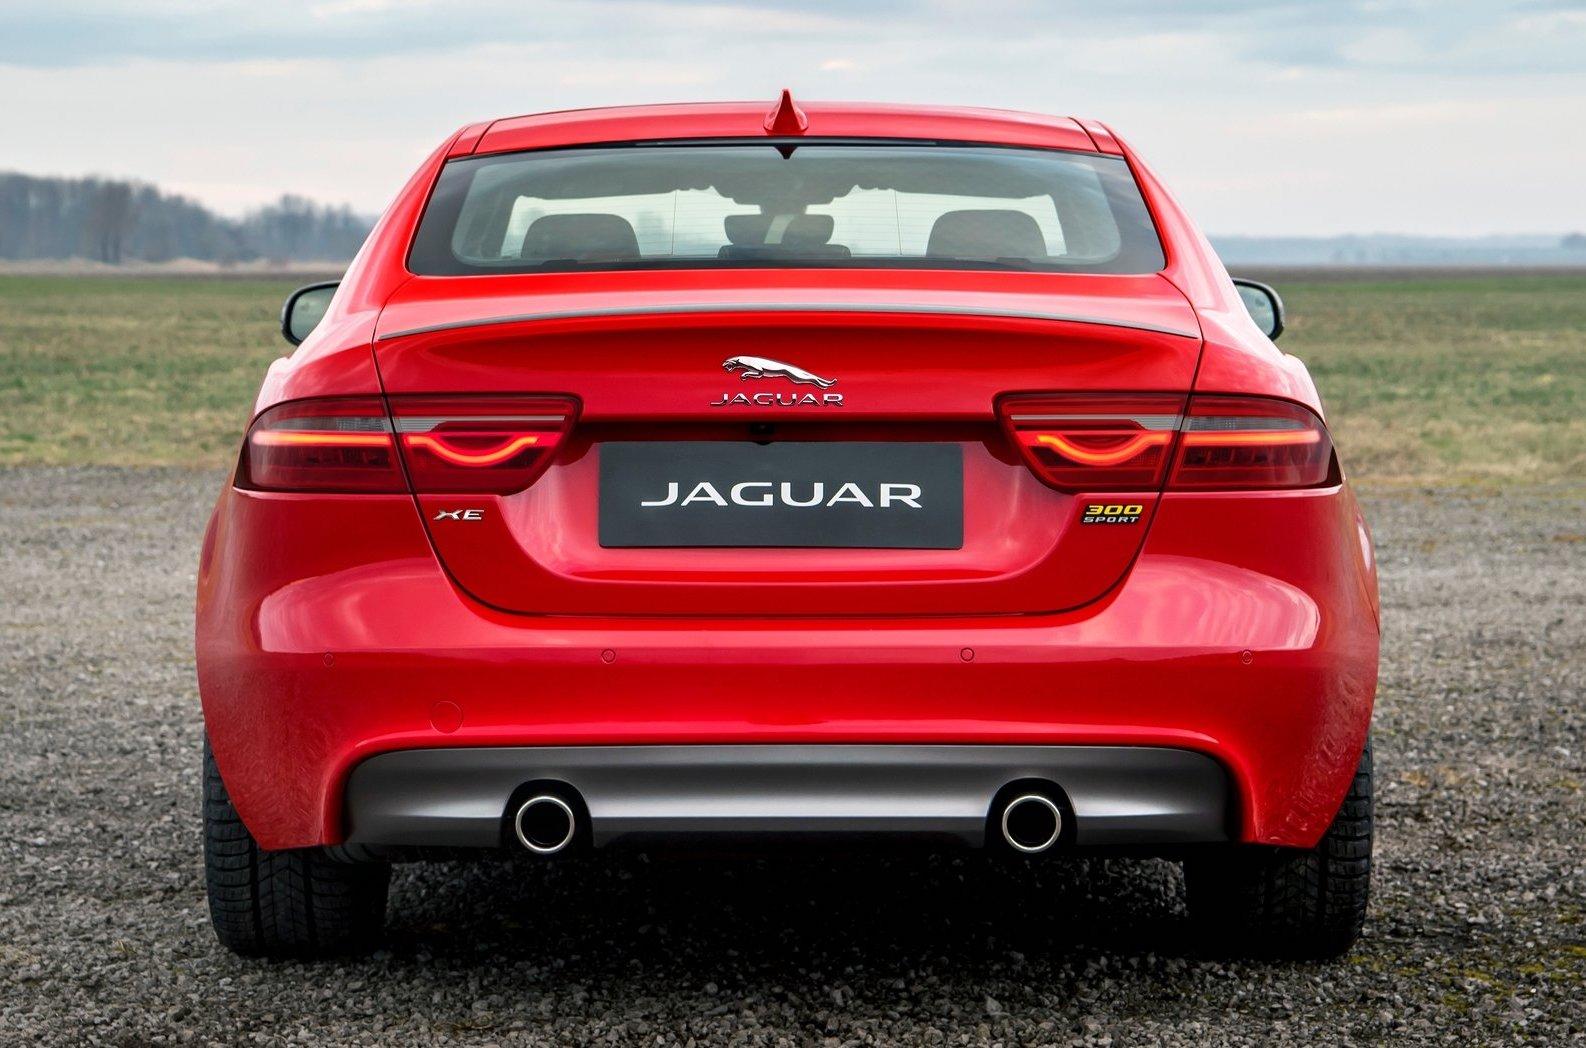 2019 Jaguar XE & XF receive new 300 Sport variant - PerformanceDrive